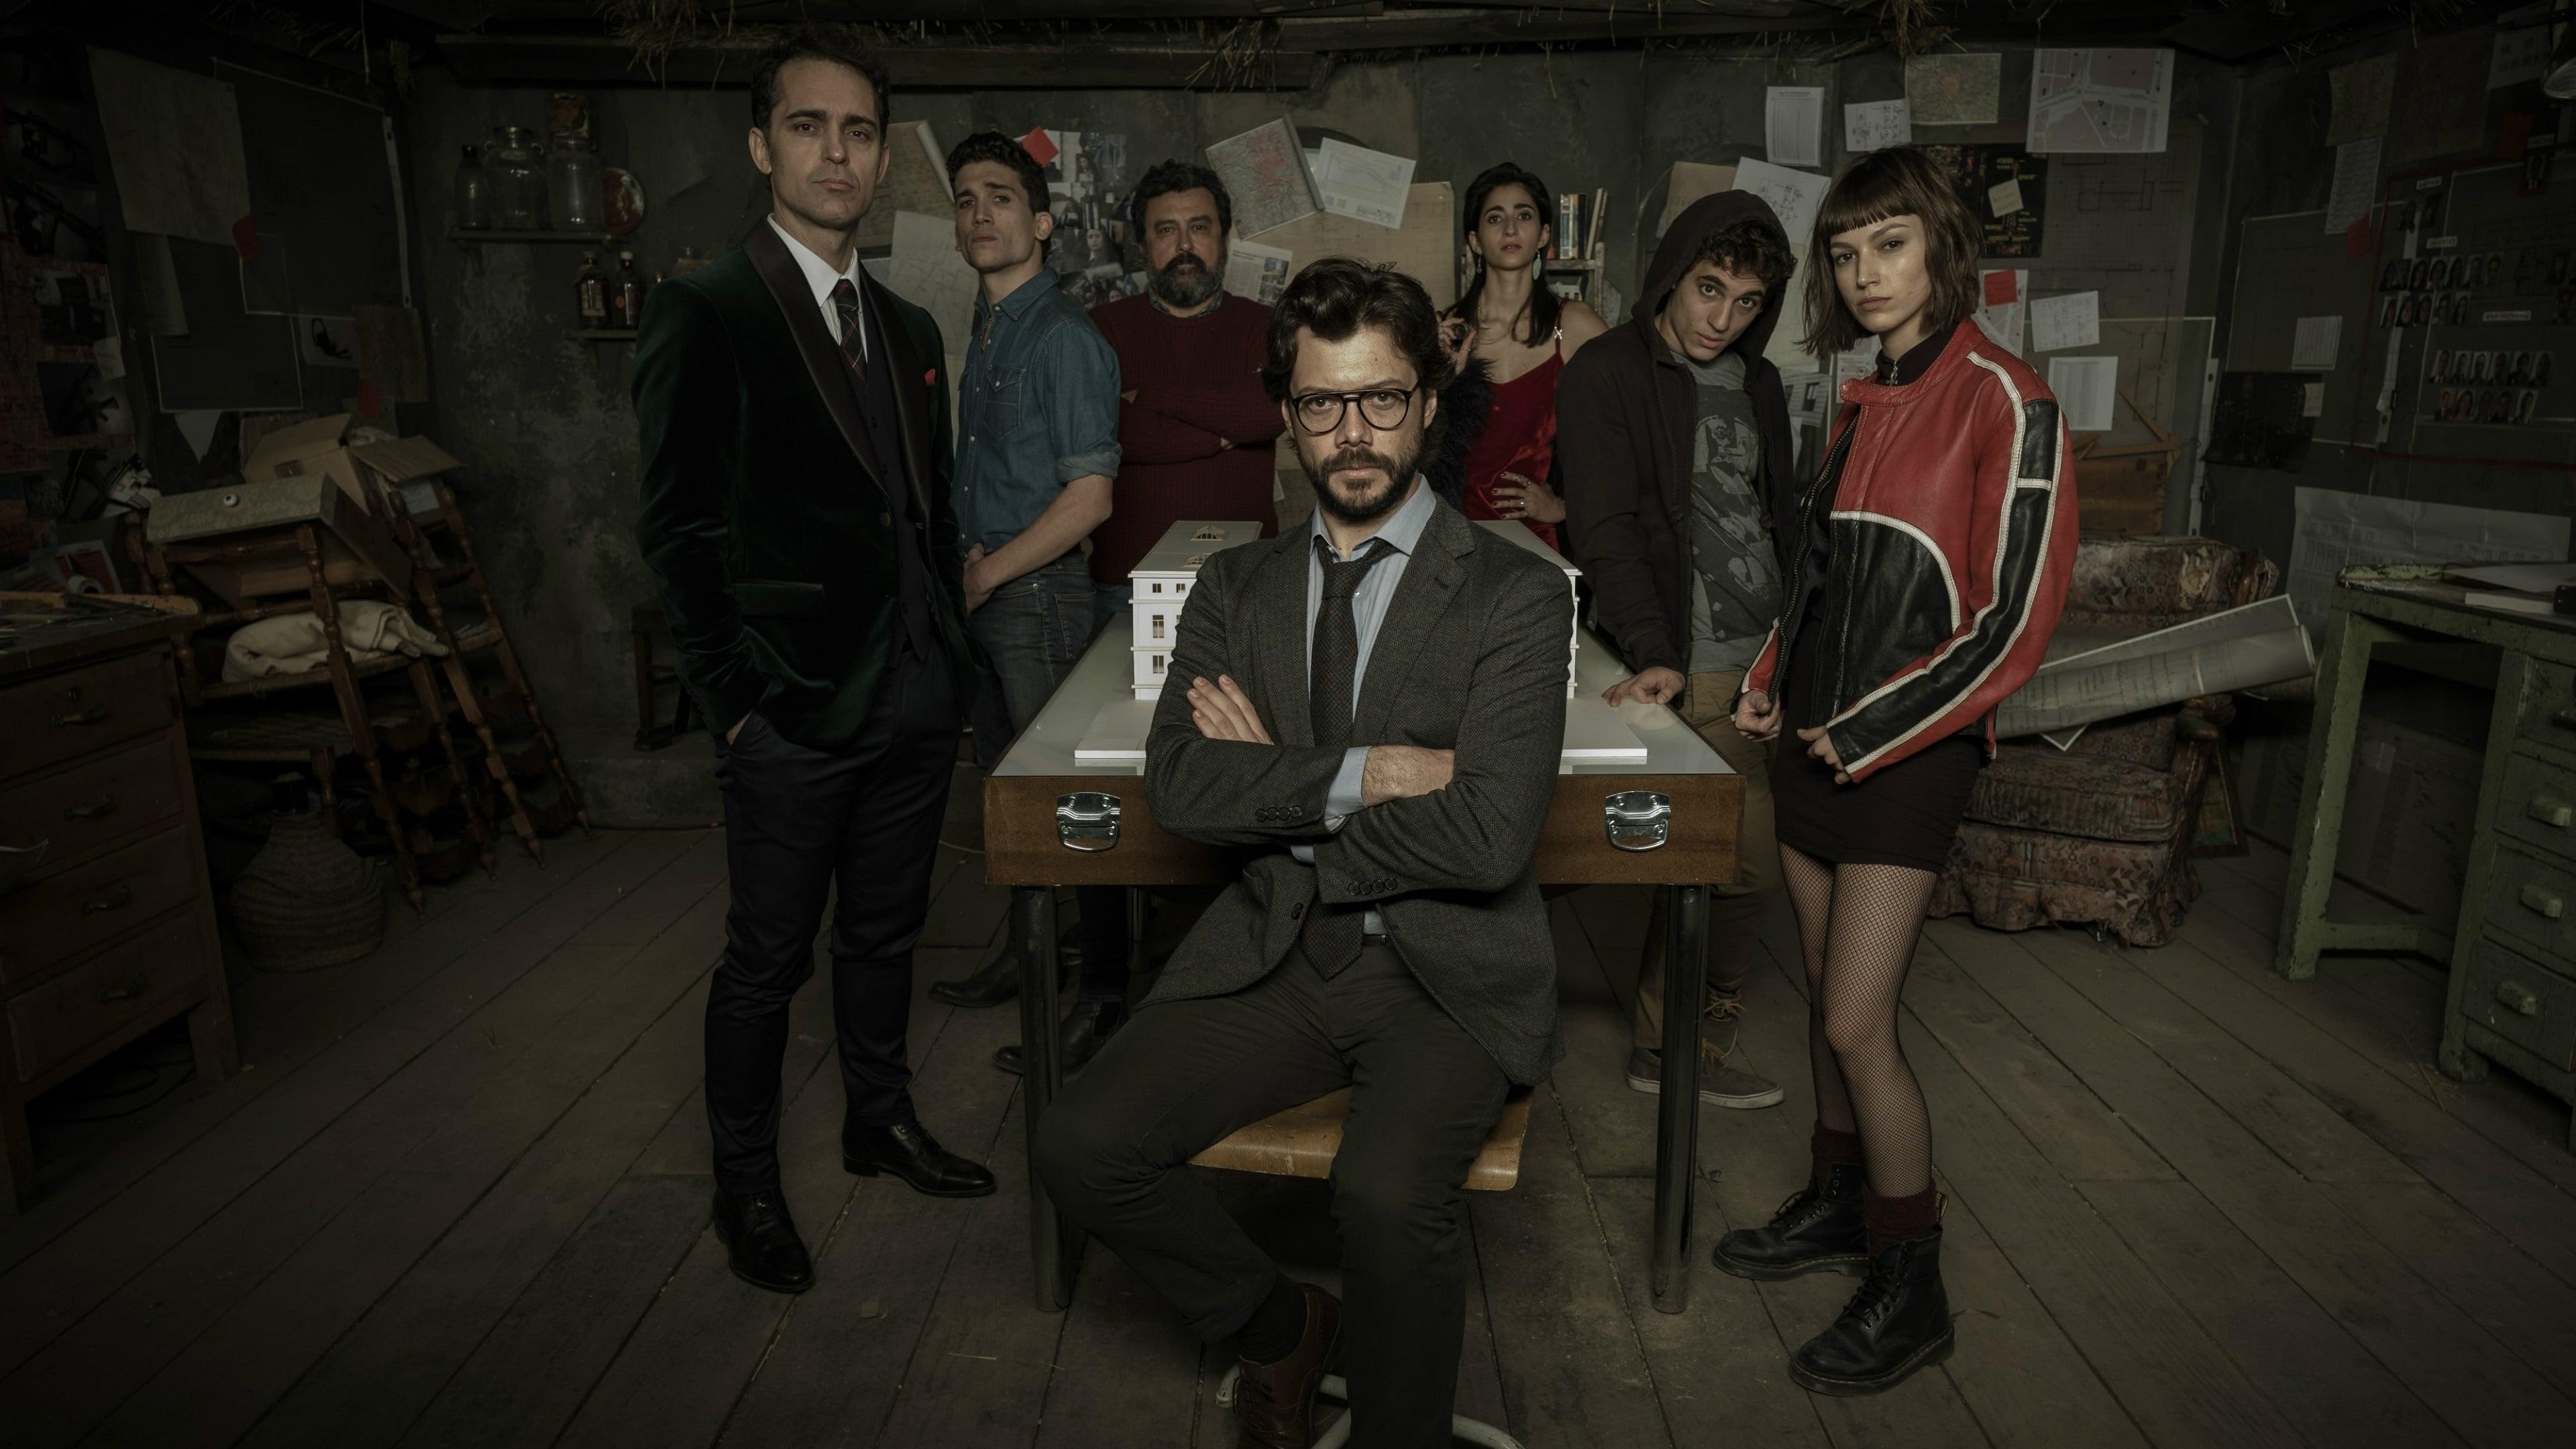 Money Heist Season 4 Wallpaper HD TV Series 4K Wallpapers Images 3840x2160